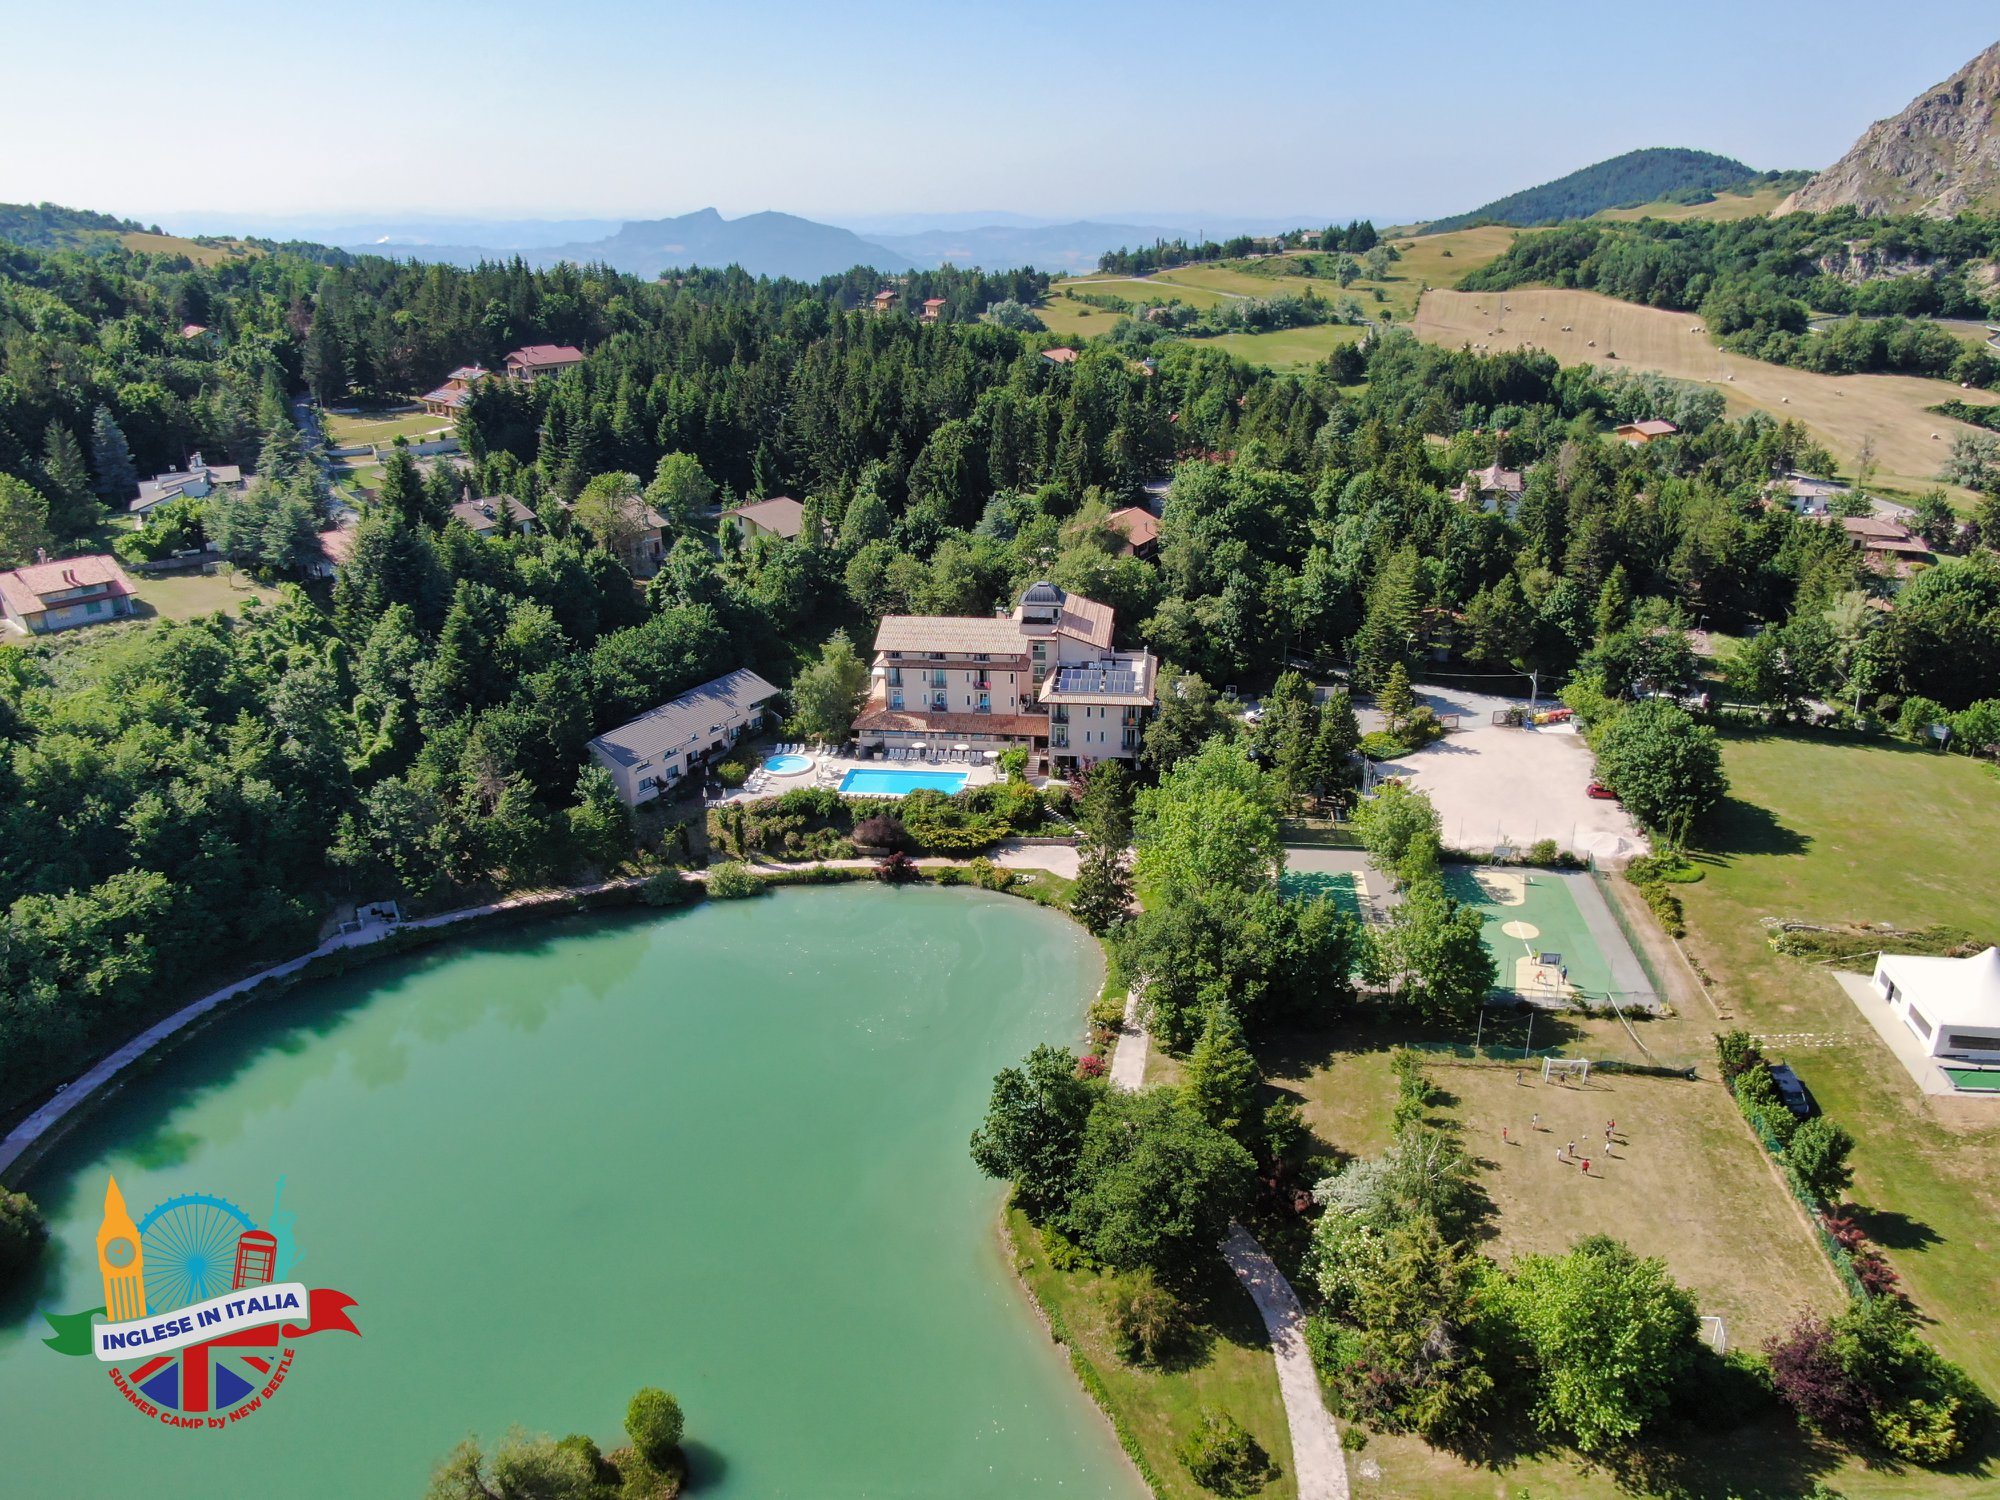 https://www.ingleseinitalia.it/wp-content/uploads/2020/05/summer_camp_inglese_in_italia_drone.jpg